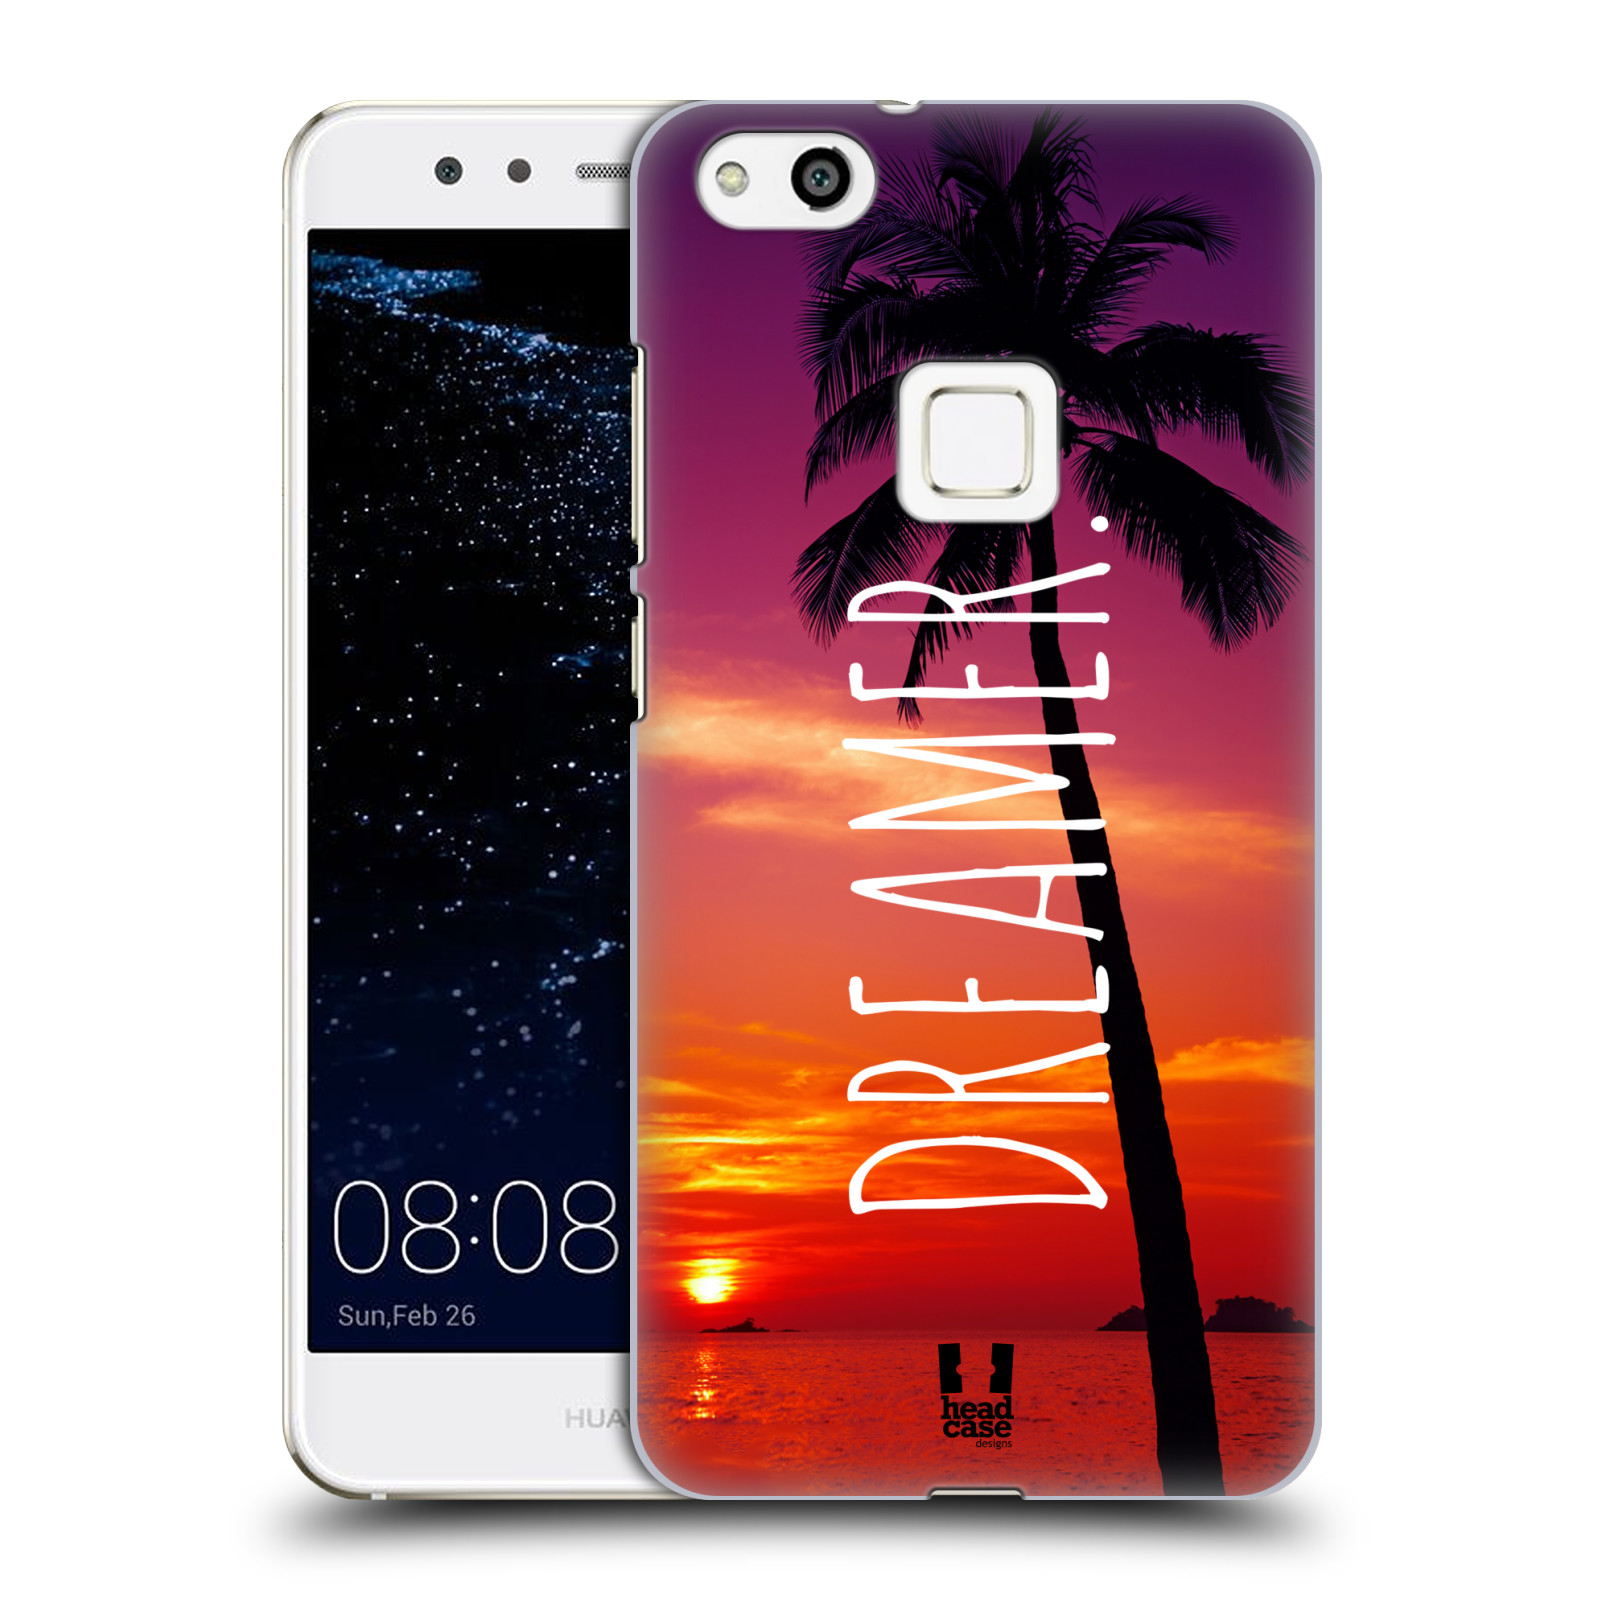 Plastové pouzdro na mobil Huawei P10 Lite Head Case - MIX DREAMER (Plastový kryt či obal na mobilní telefon Huawei P10 Lite Dual SIM (LX1/LX1A))